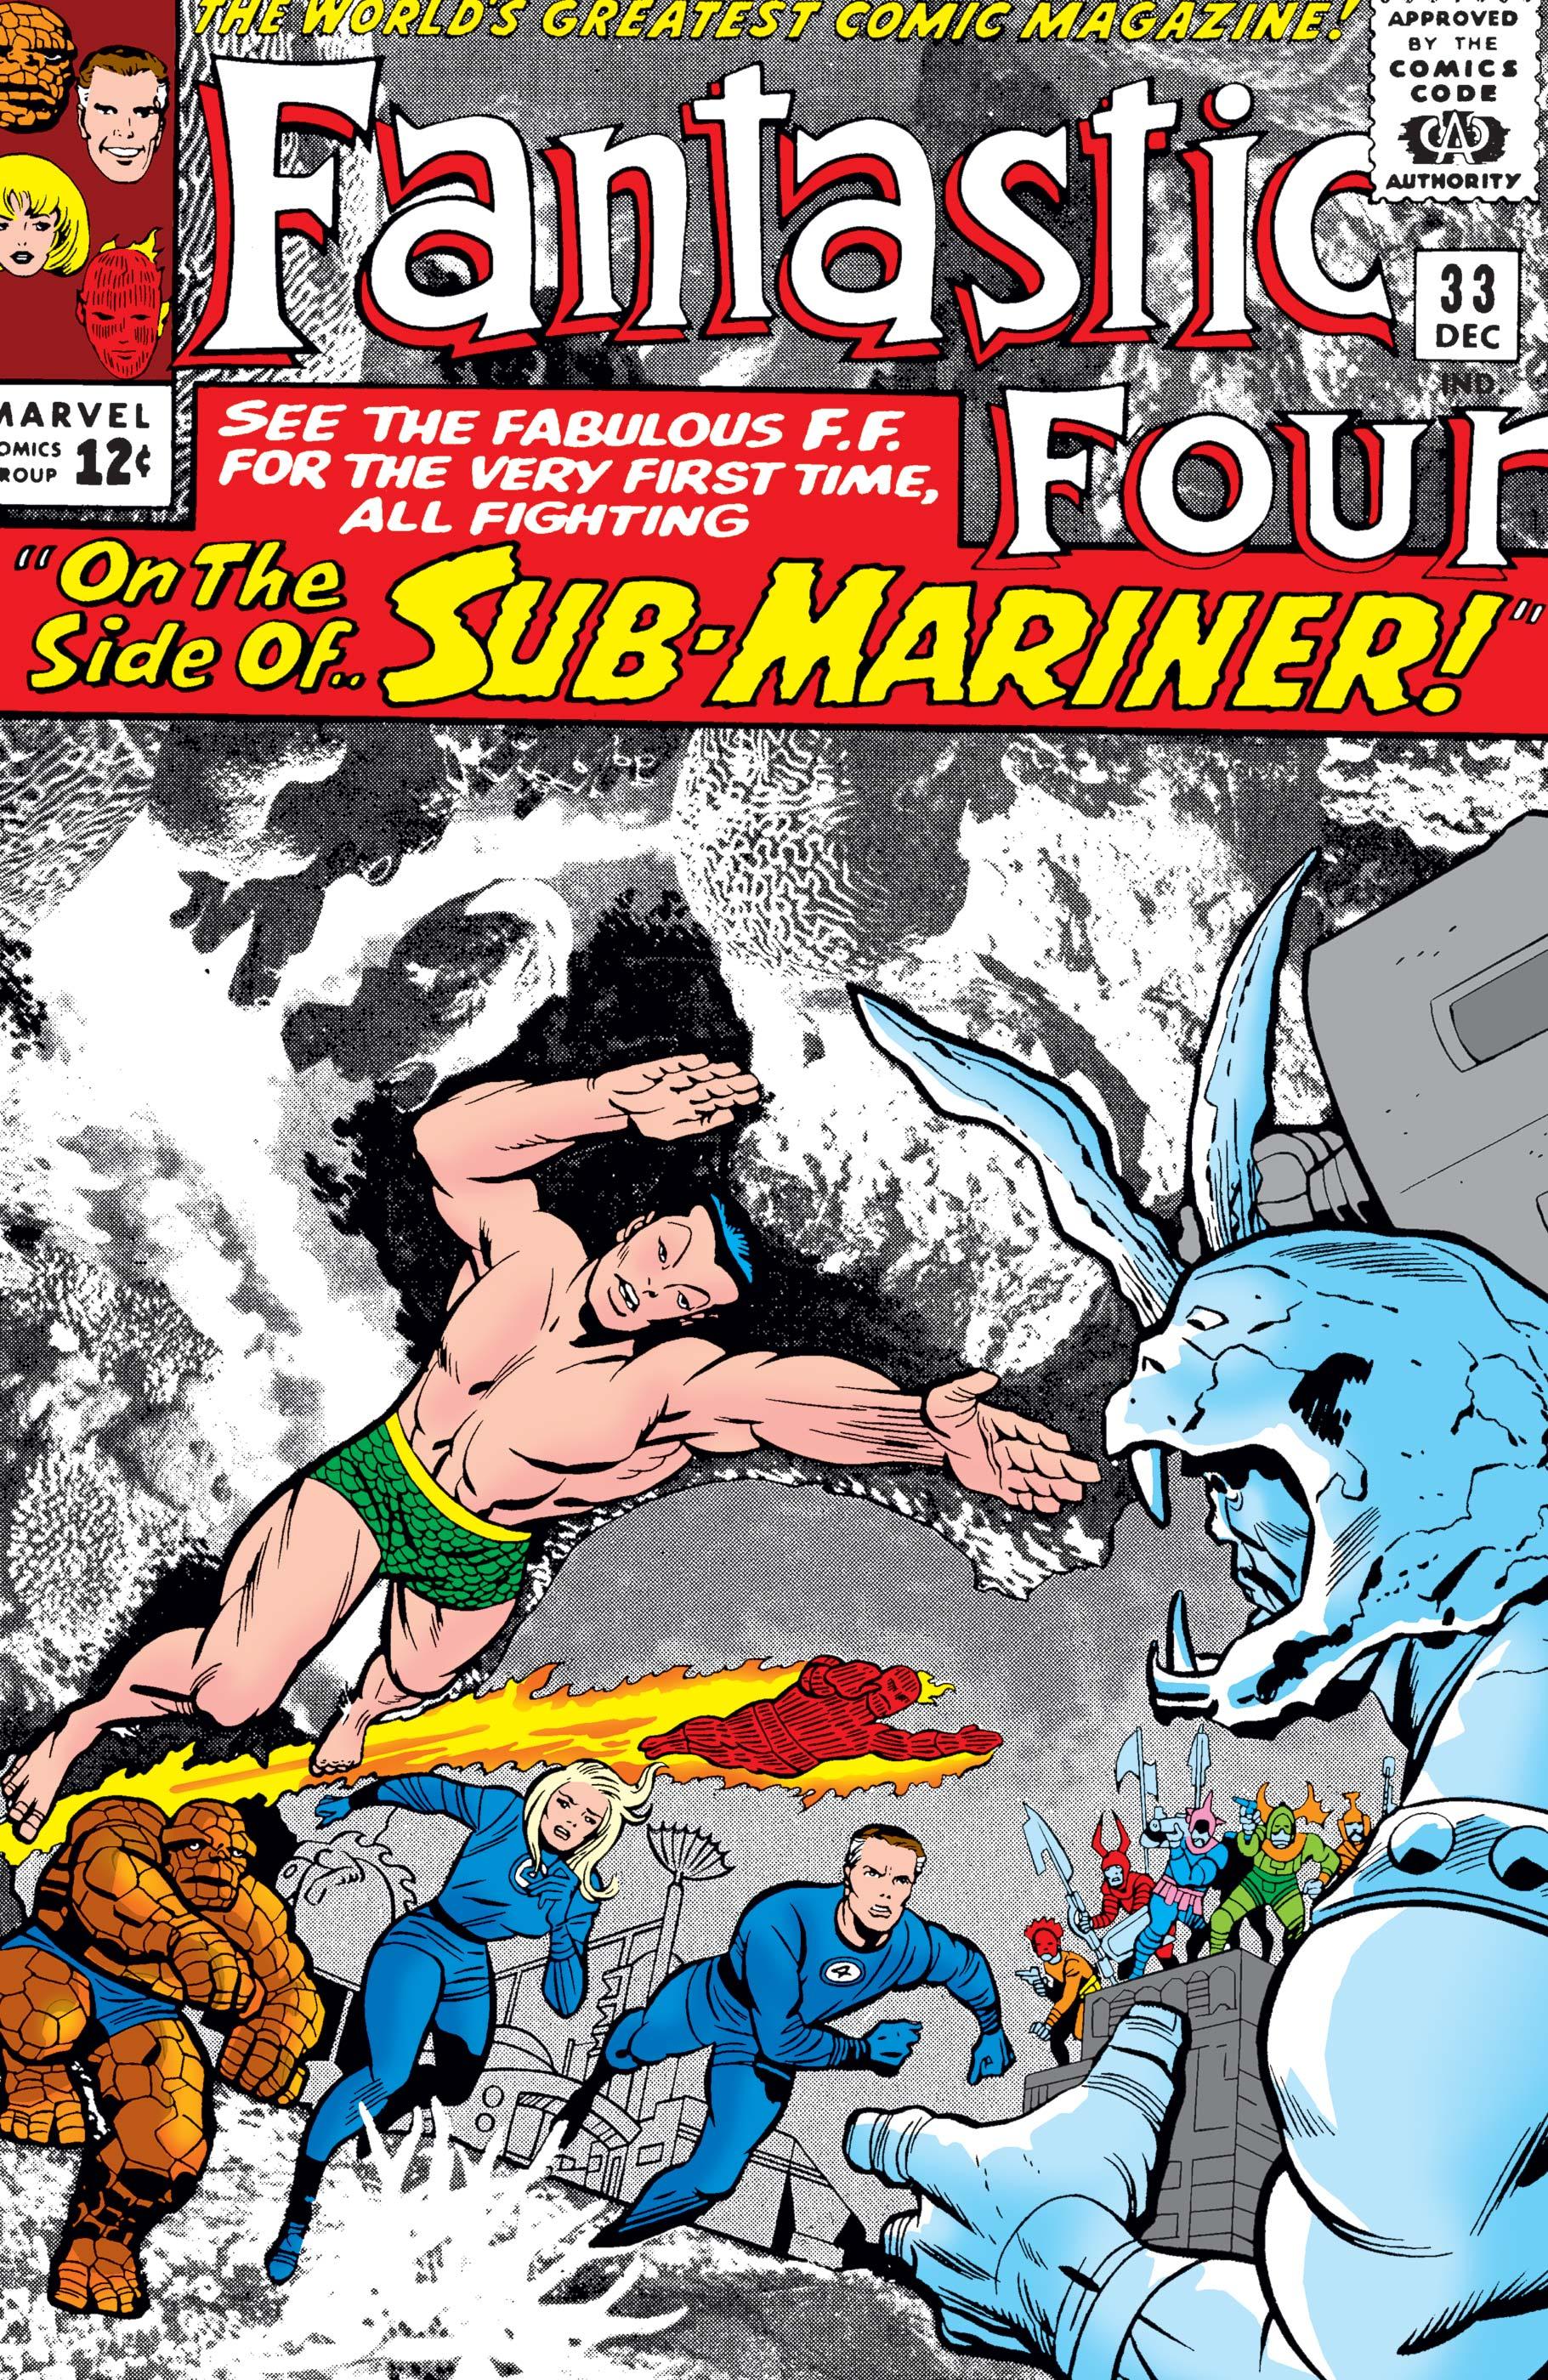 Fantastic Four (1961) #33